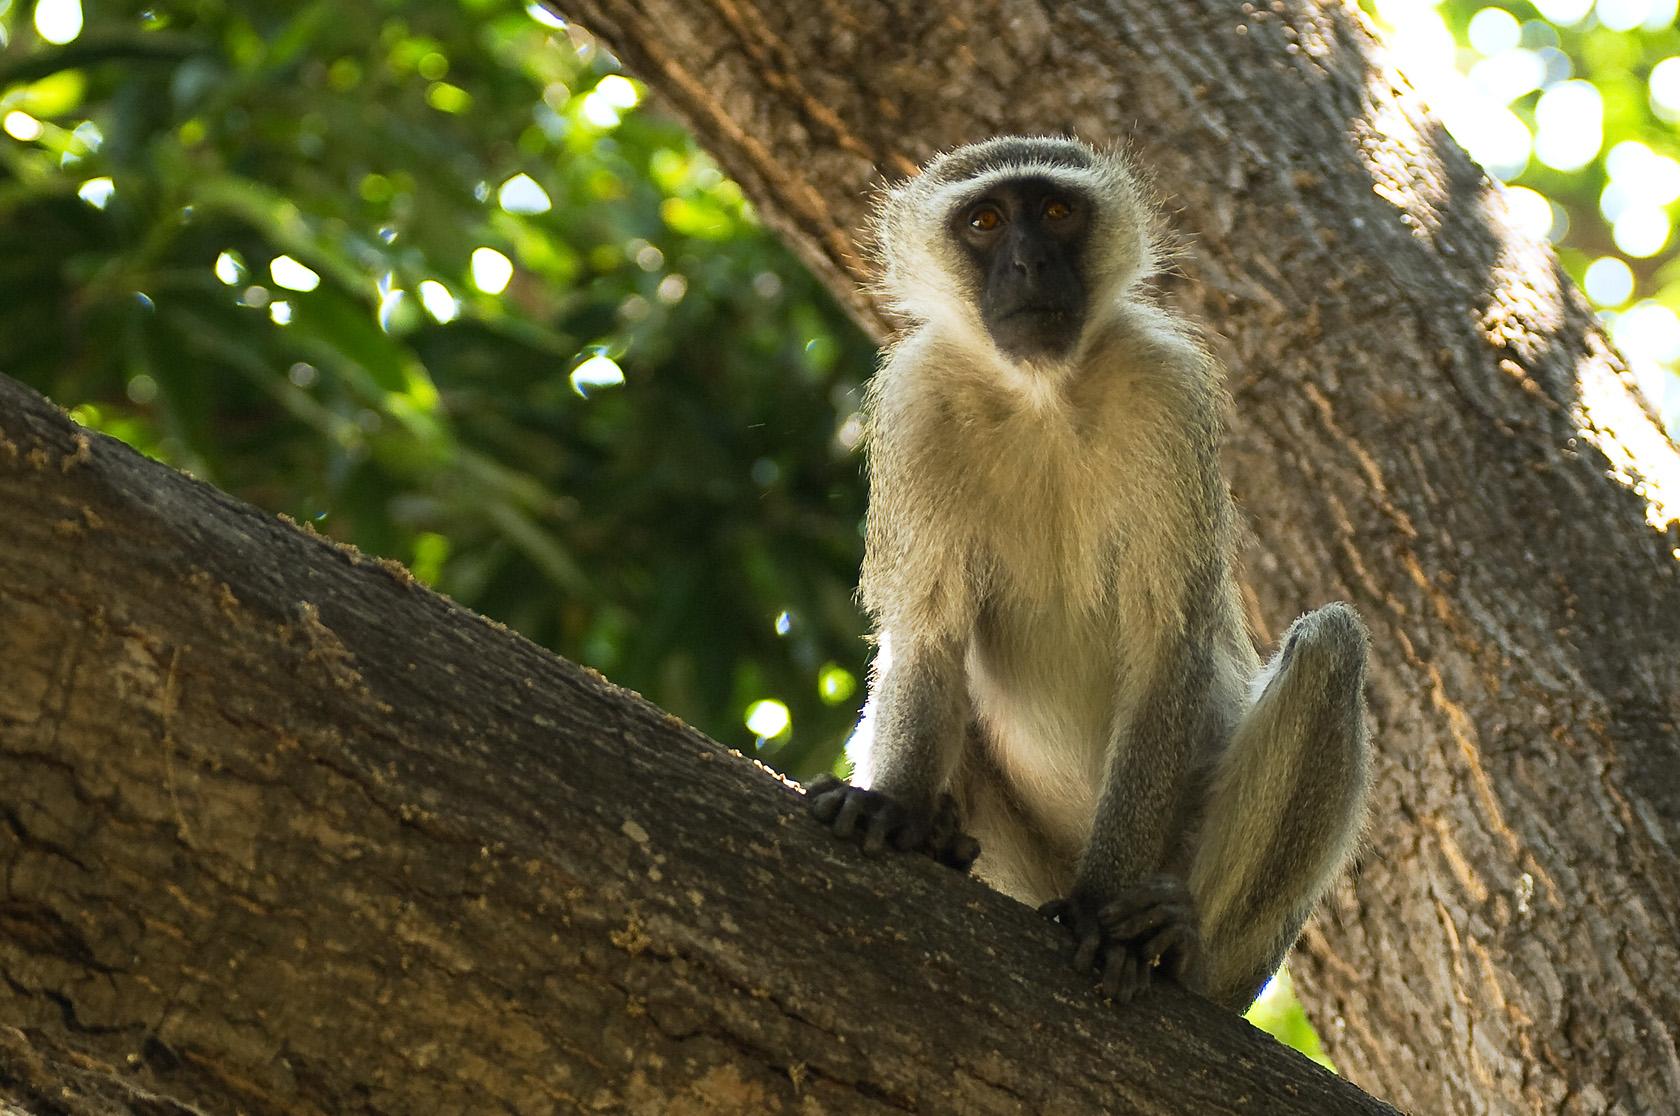 Pumulani Kenya Monkey